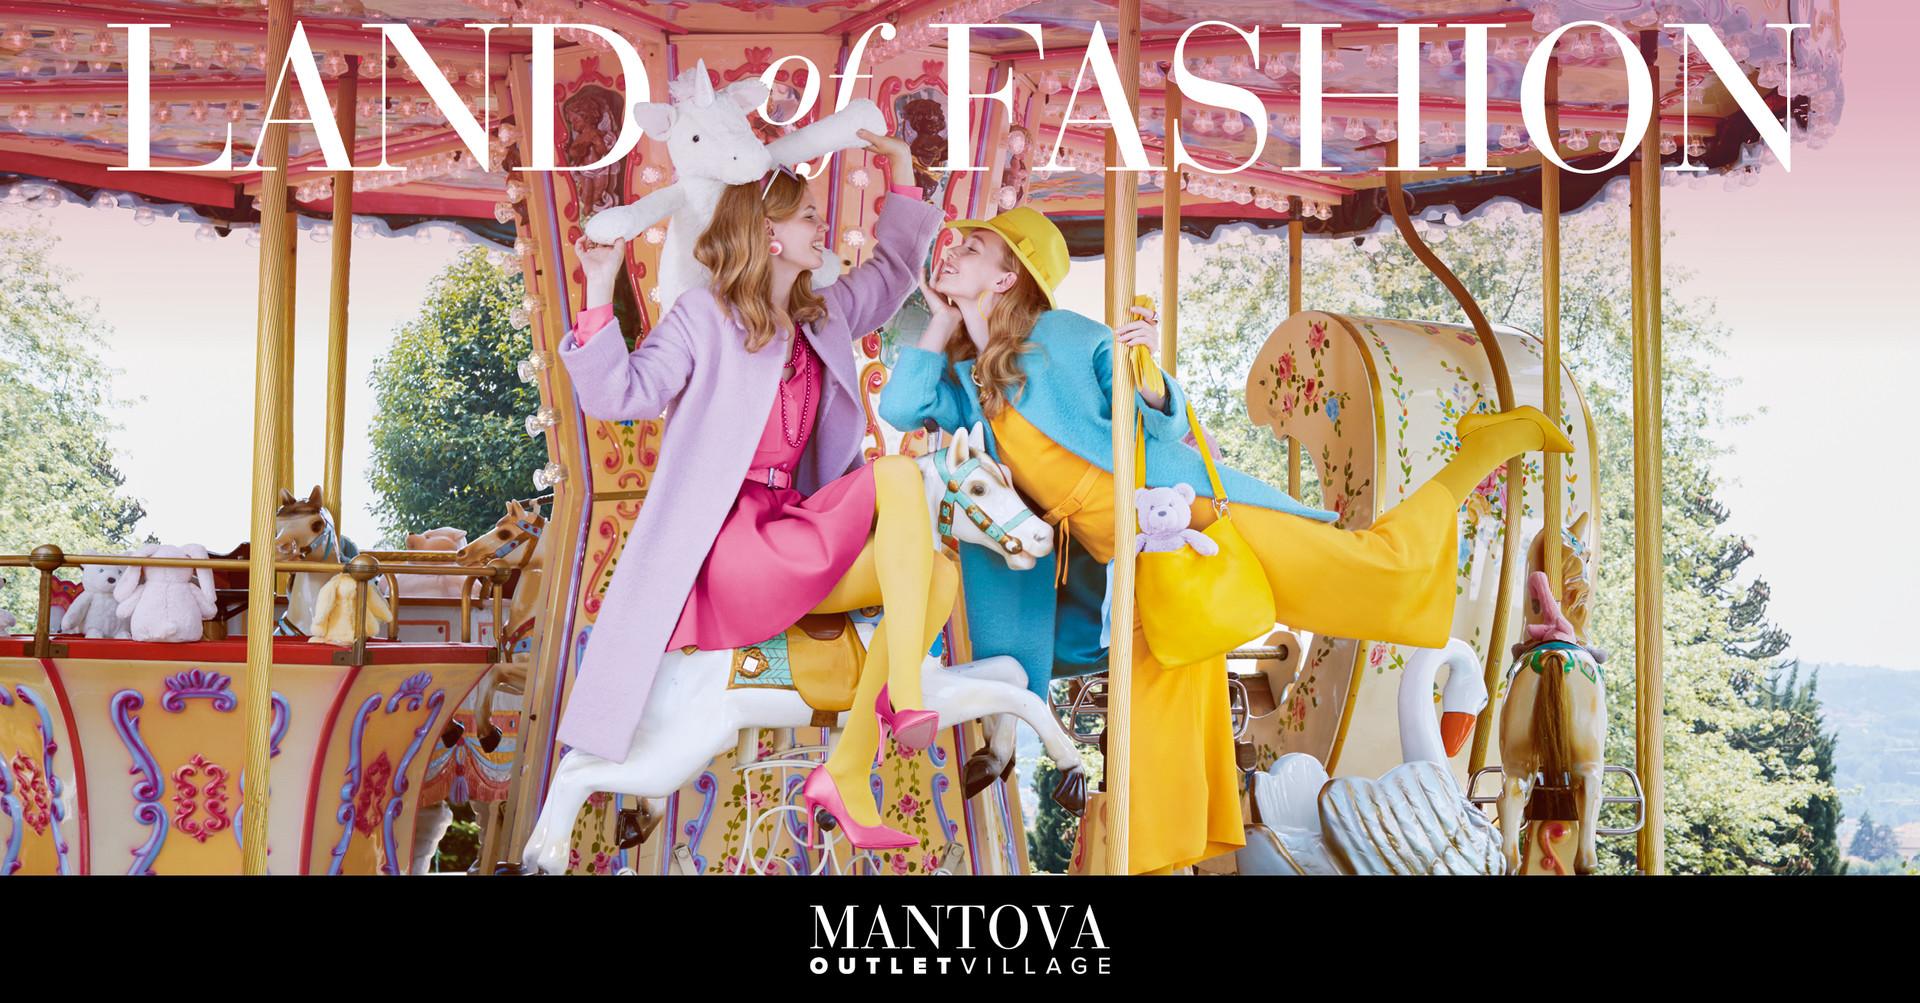 Fashion district Mantova outlet village